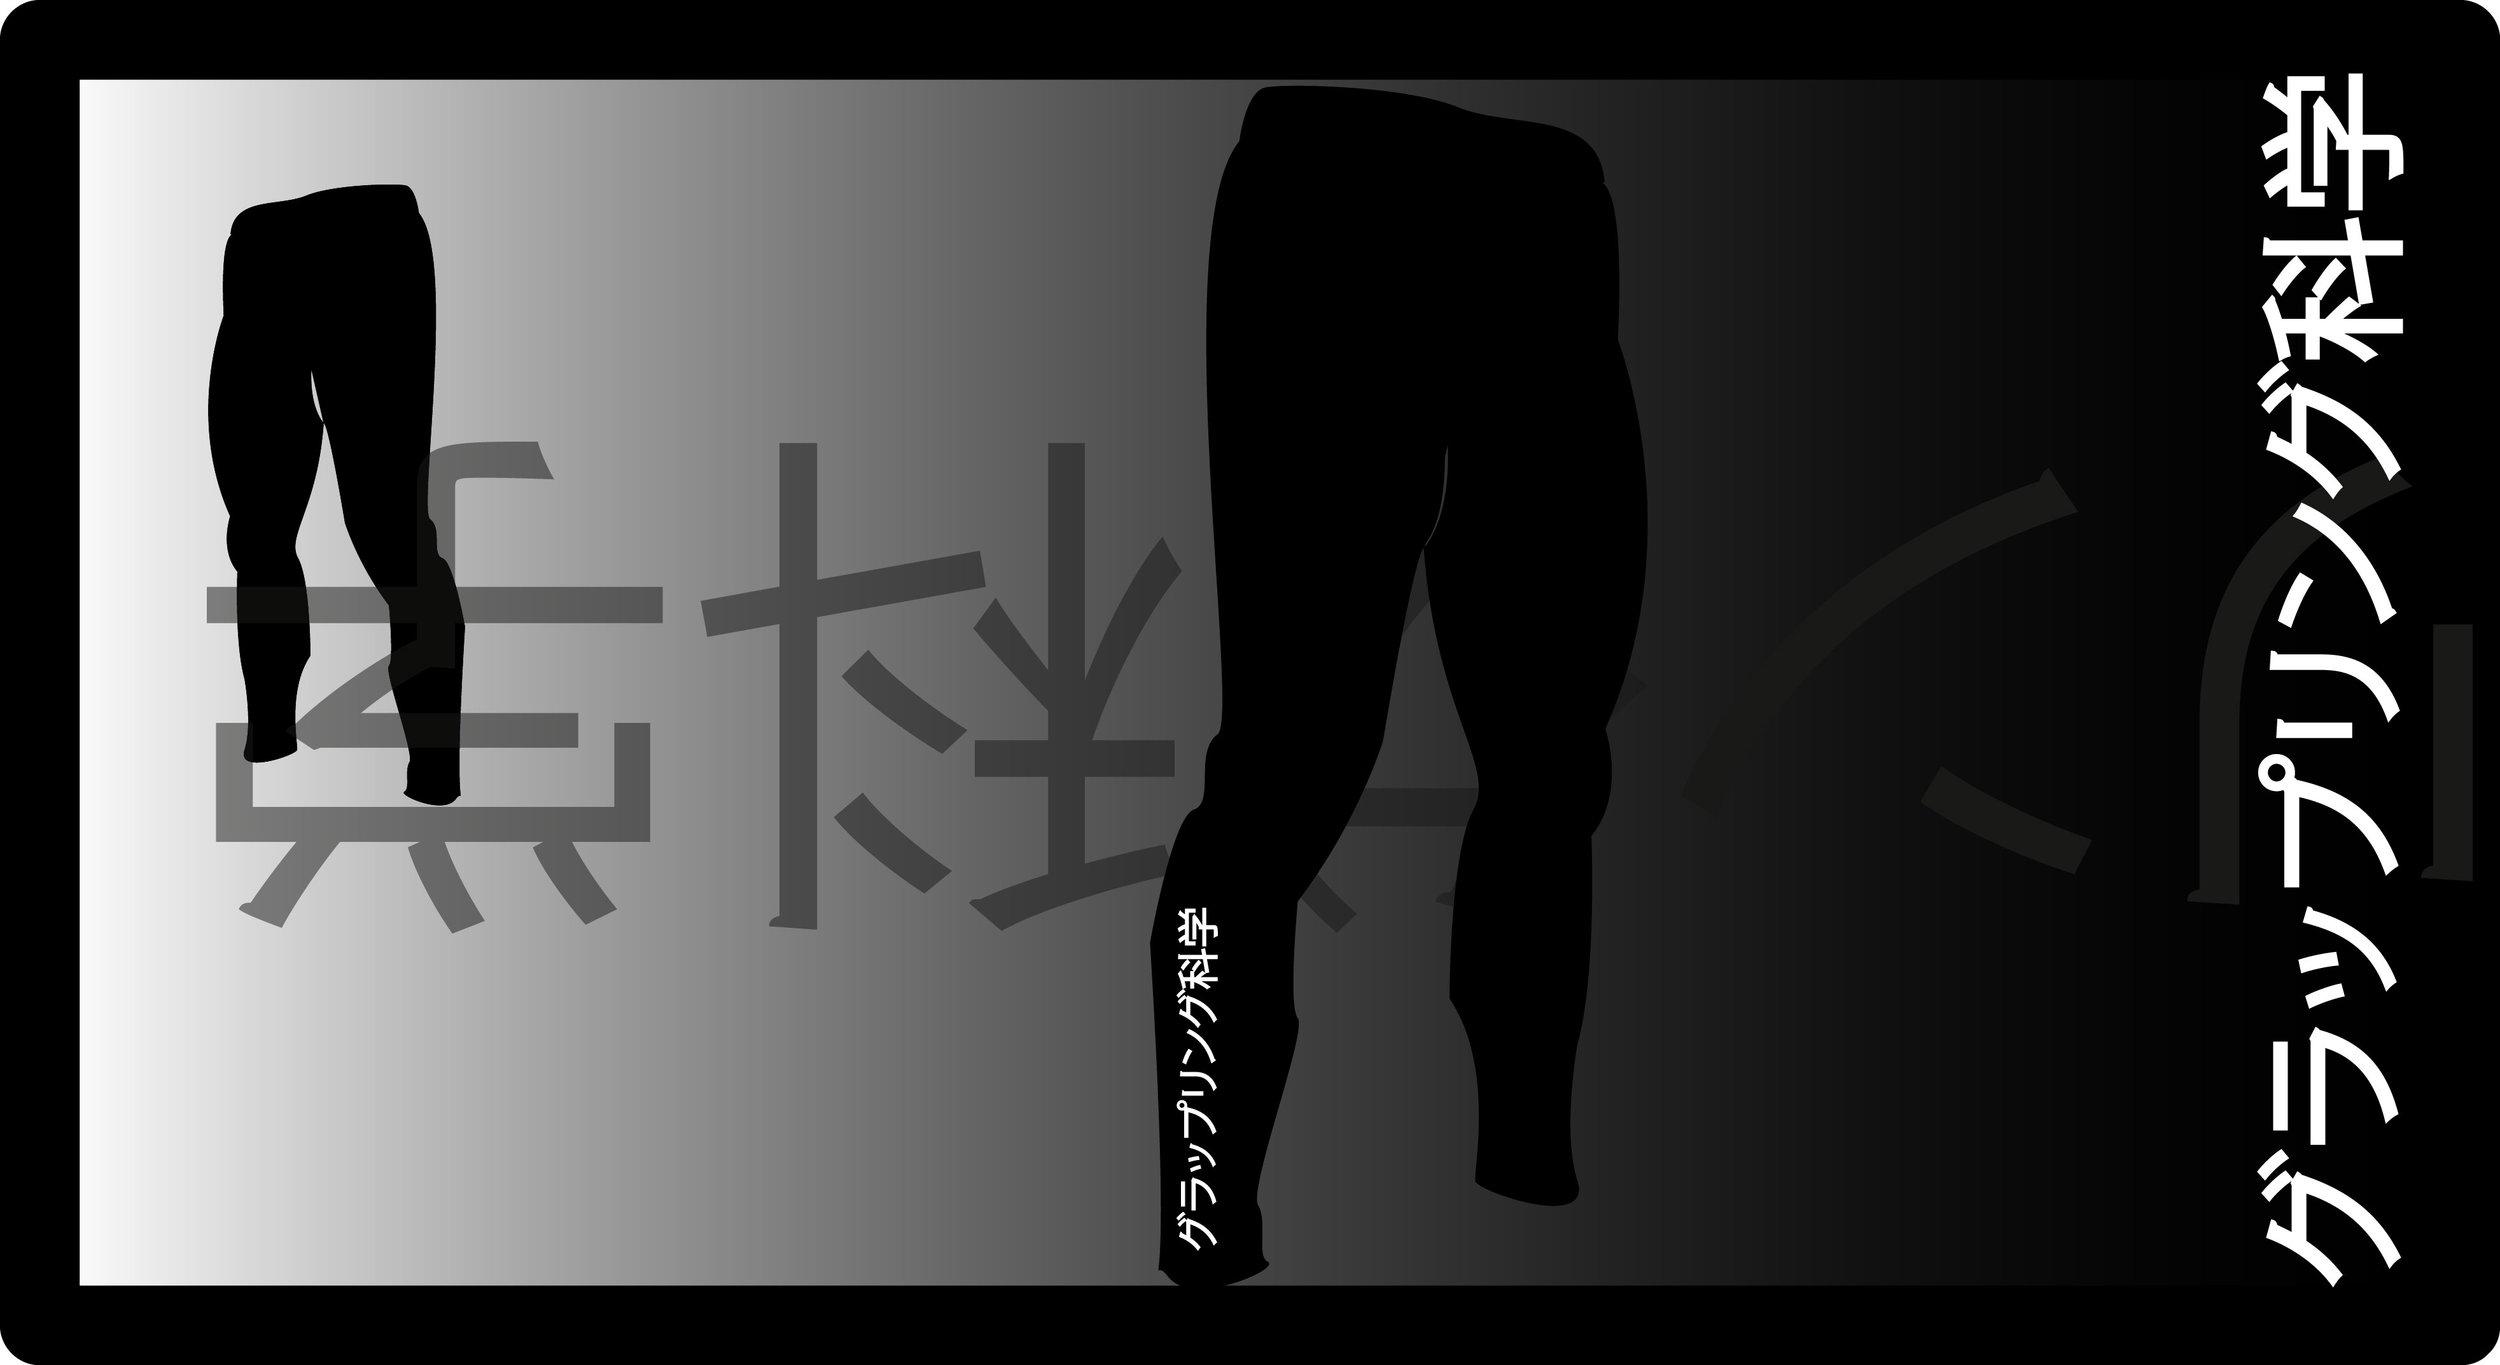 Custom spats